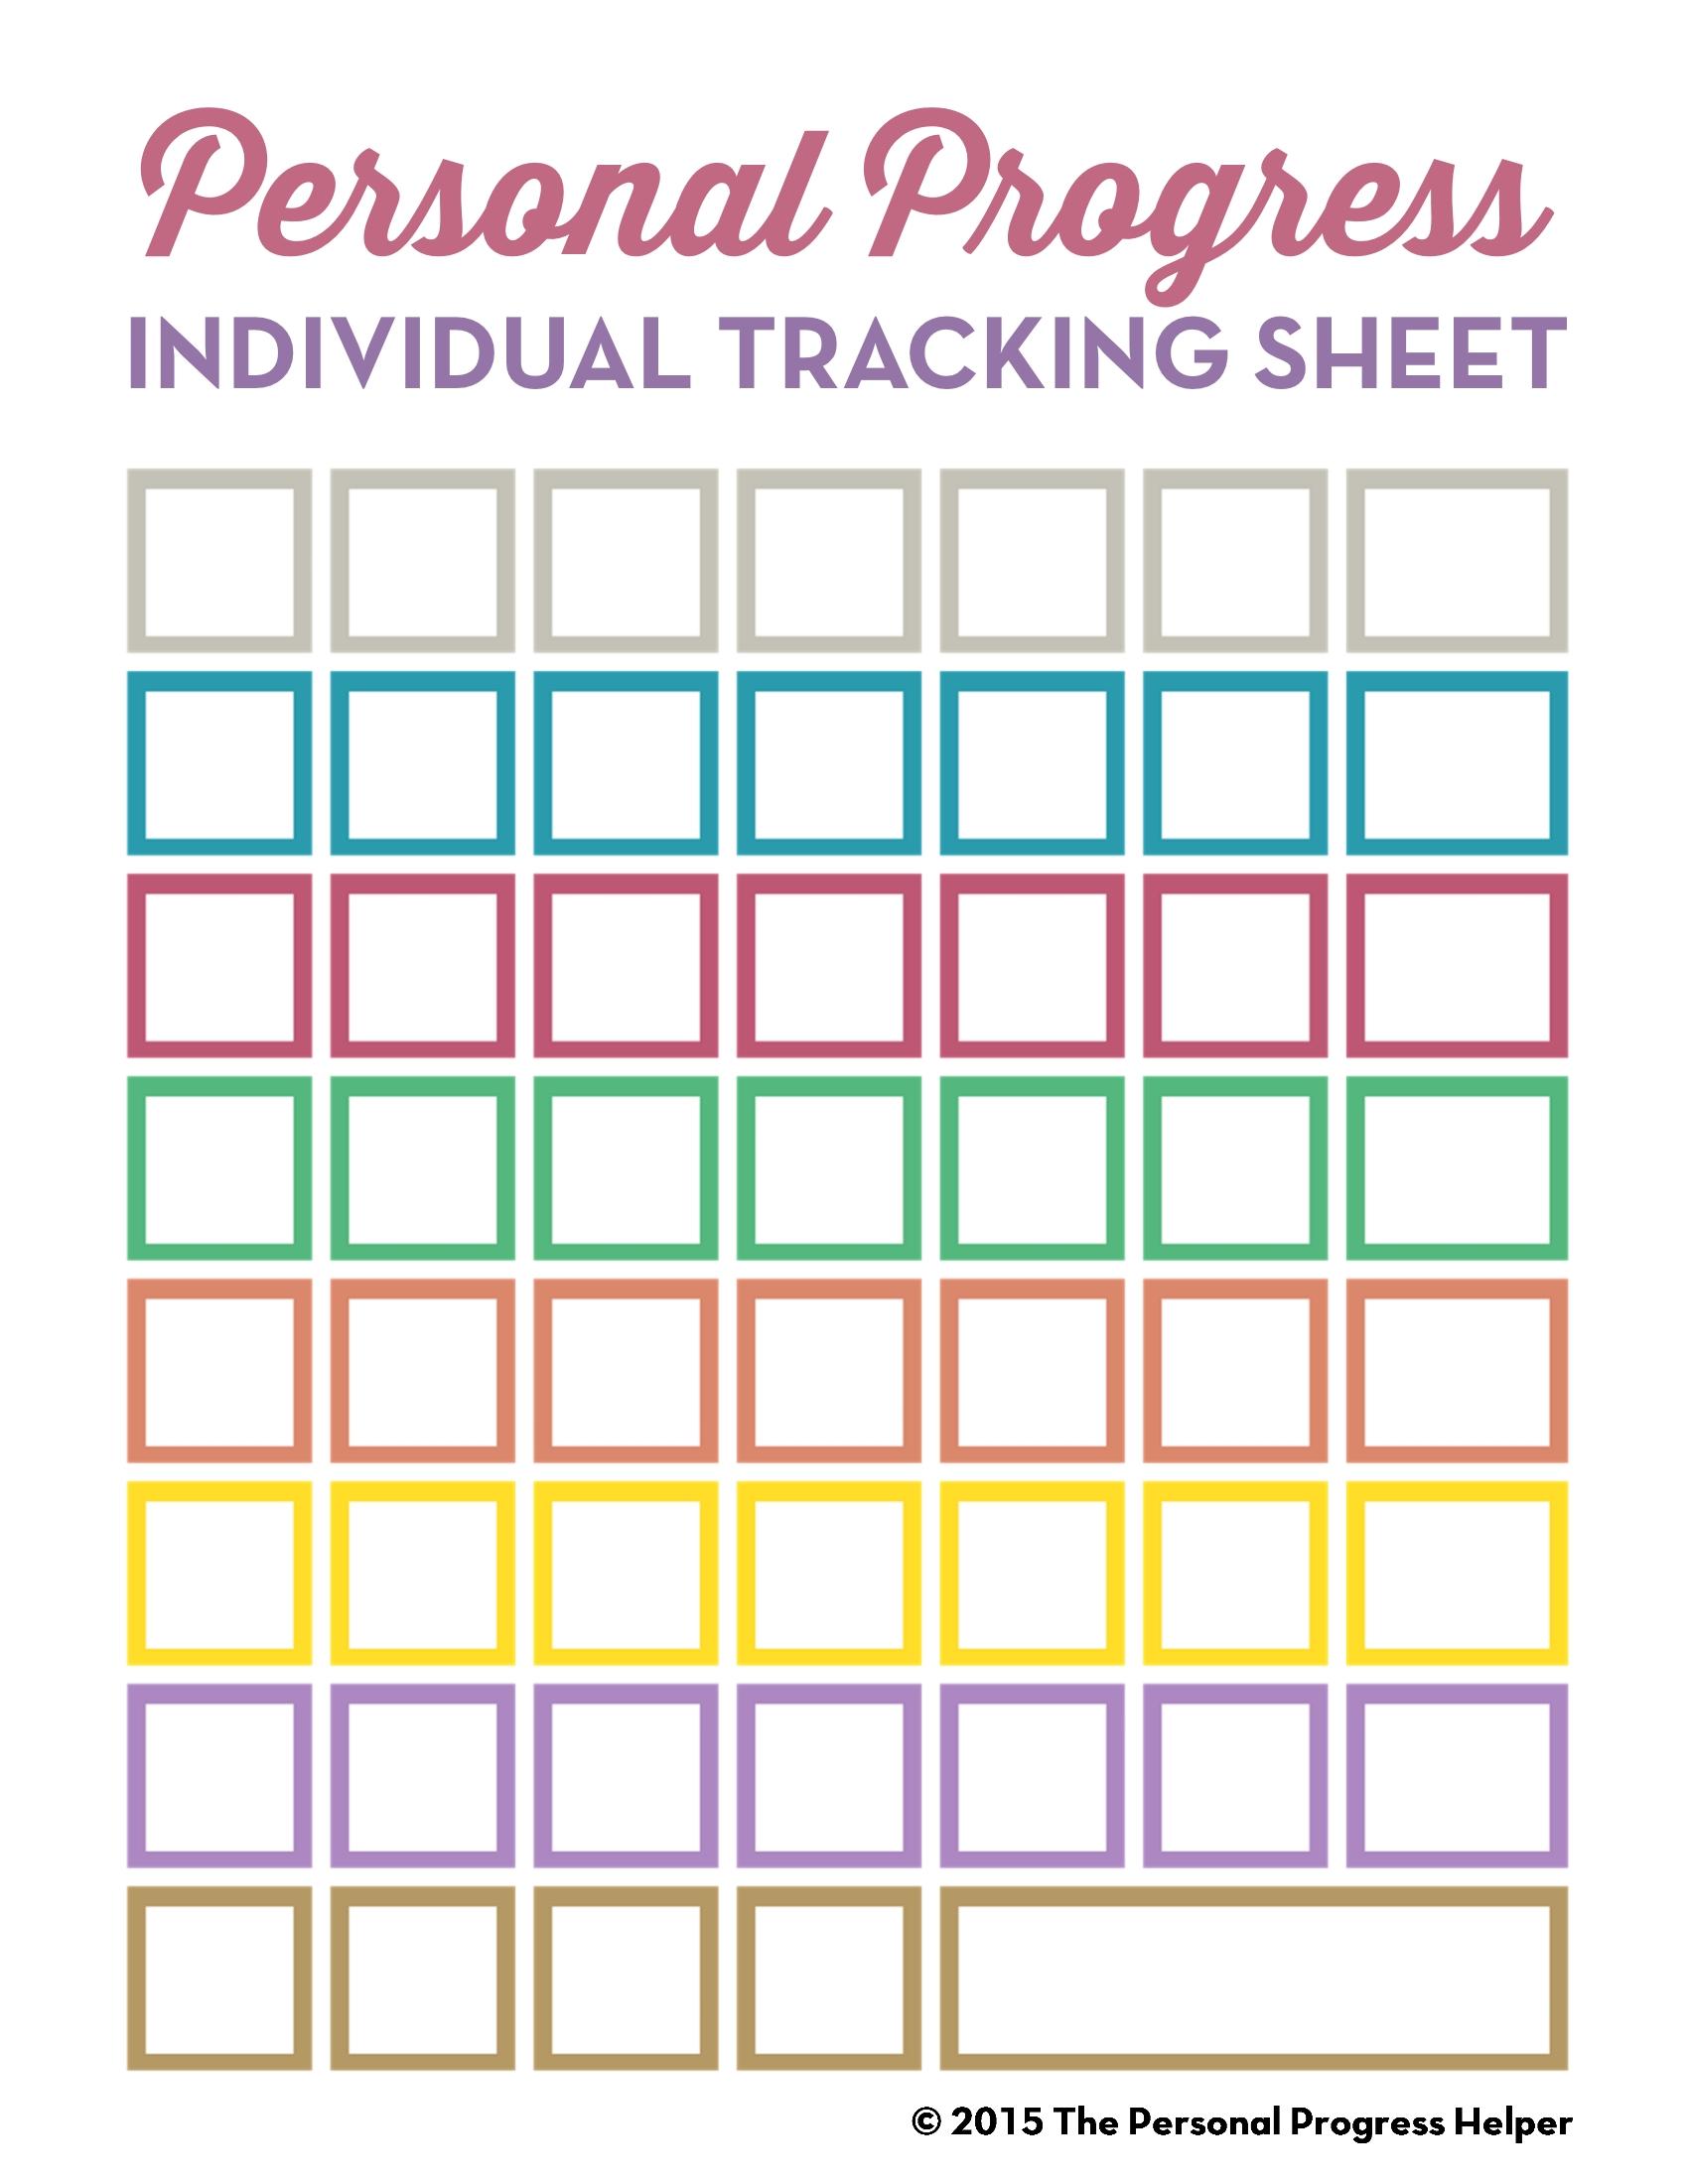 Personal Progress Individual Tracking Sheet